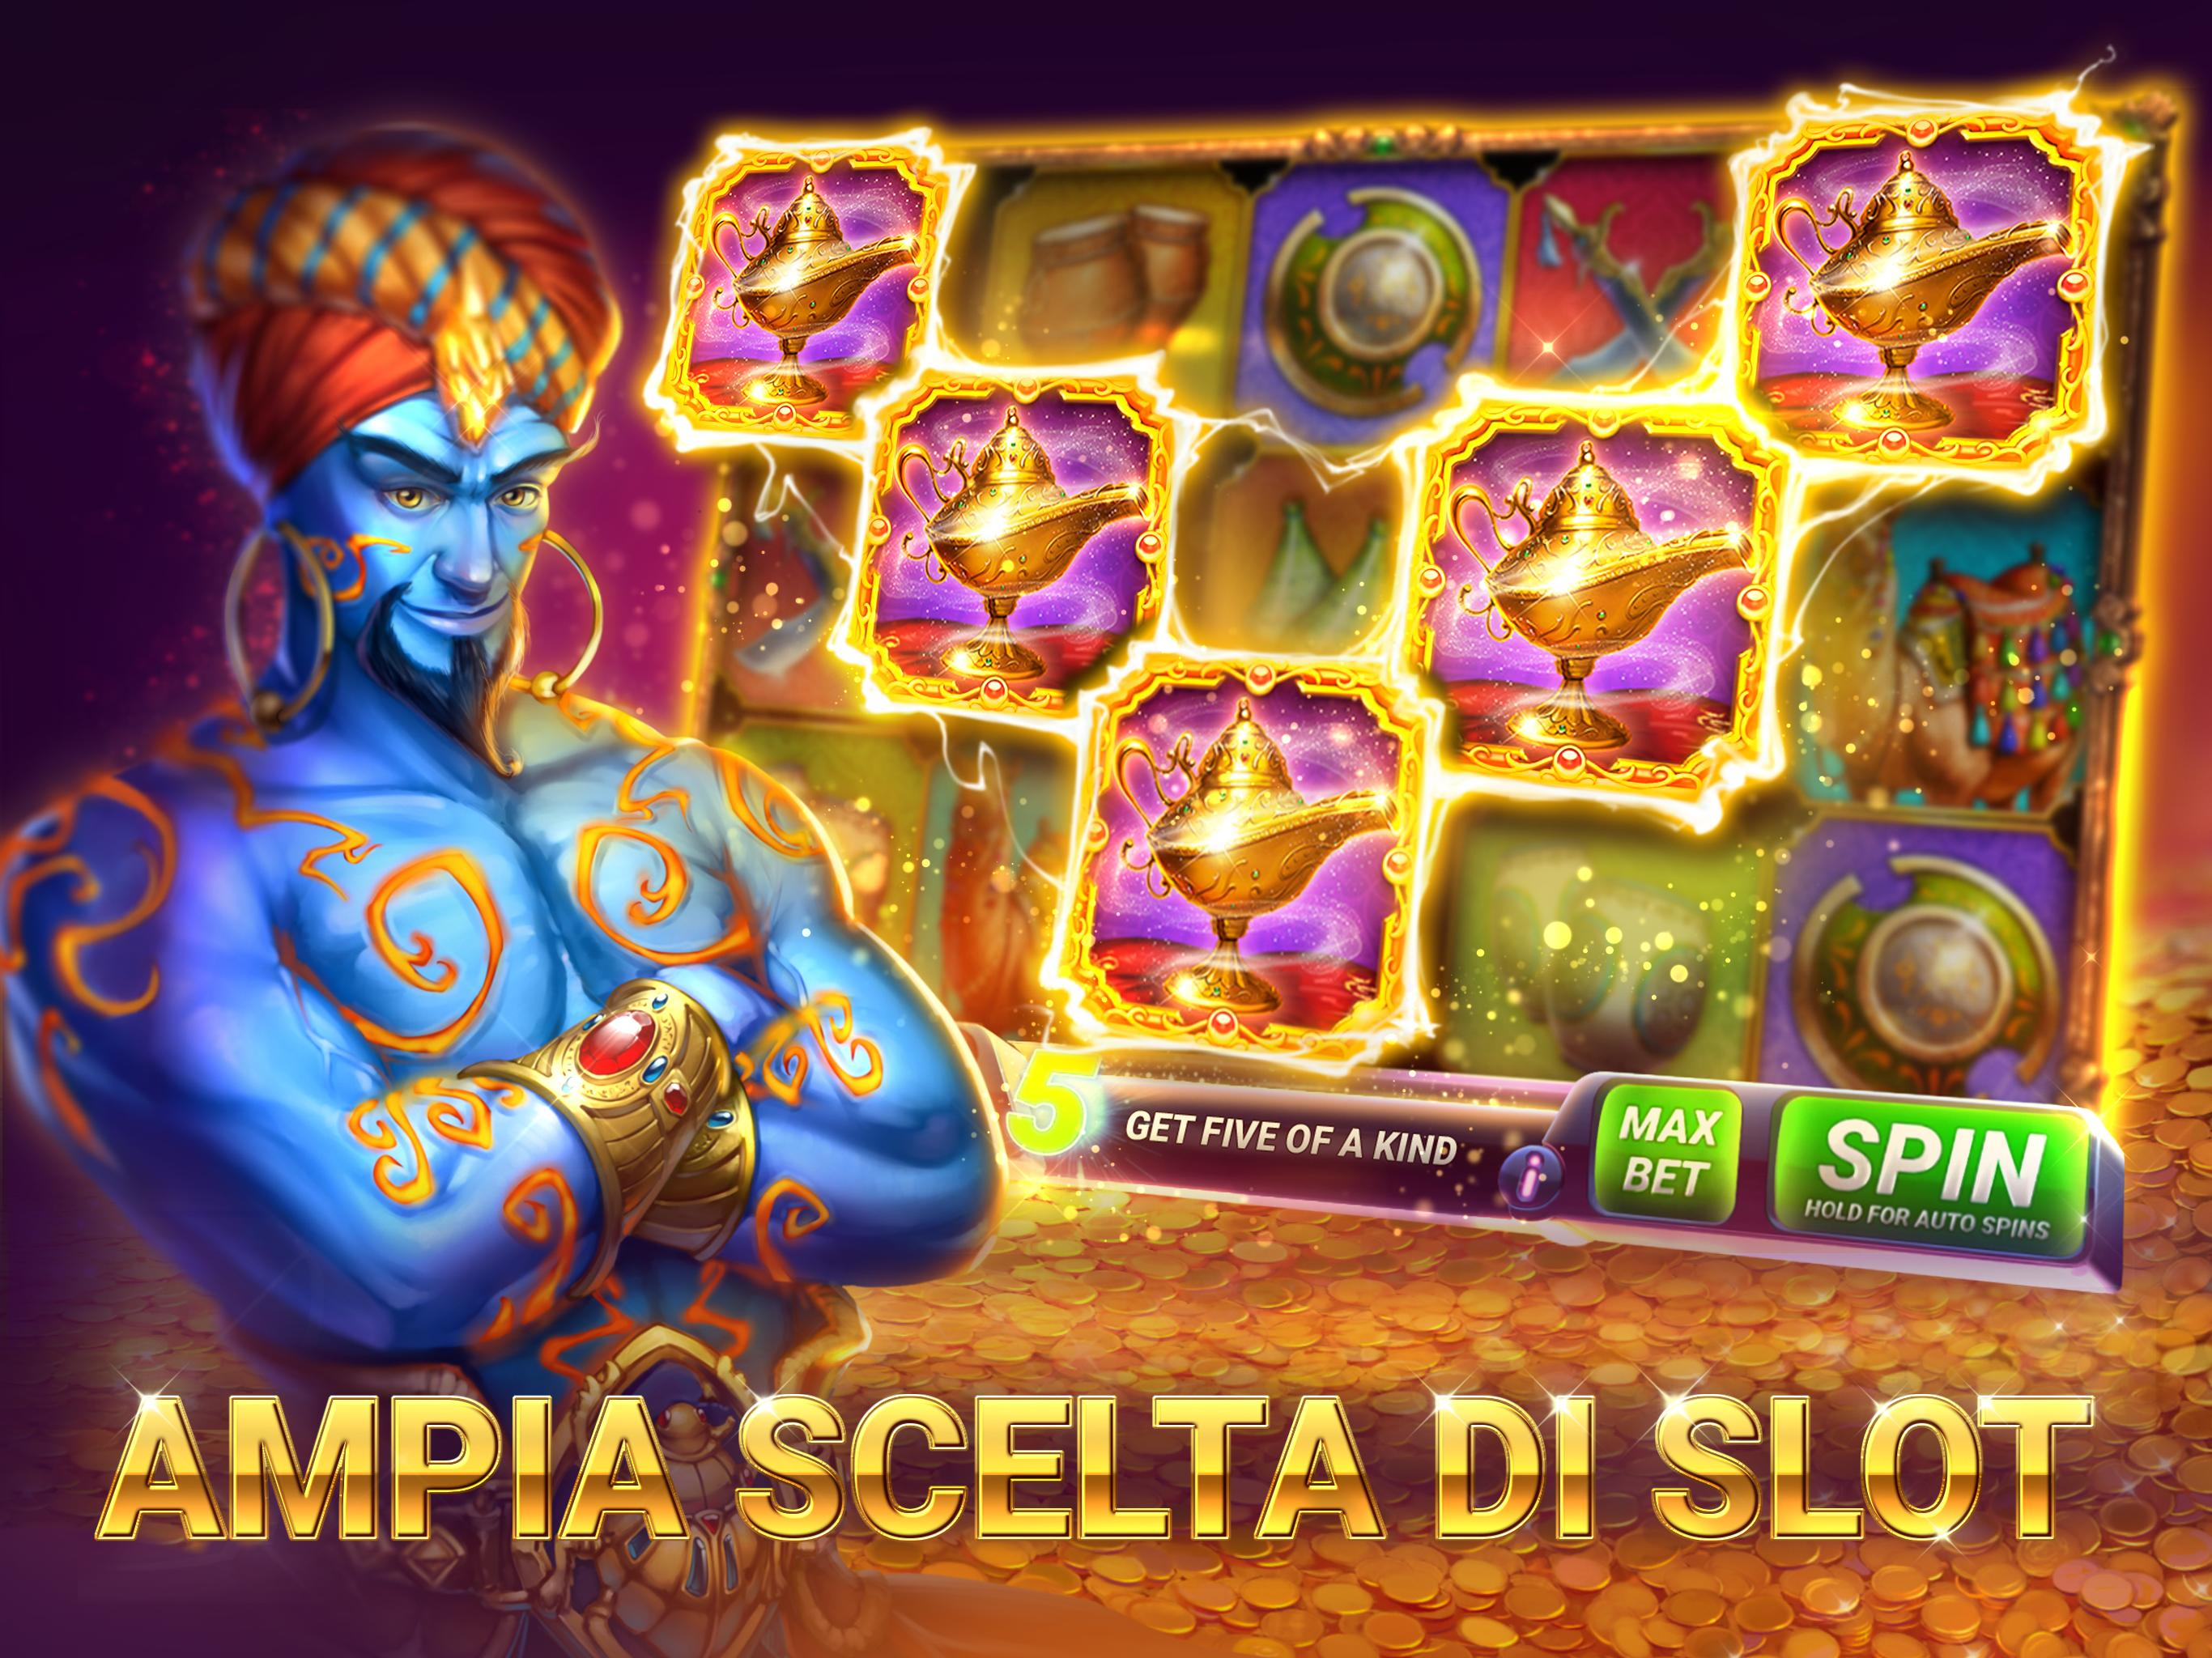 Triple 7 slot machine